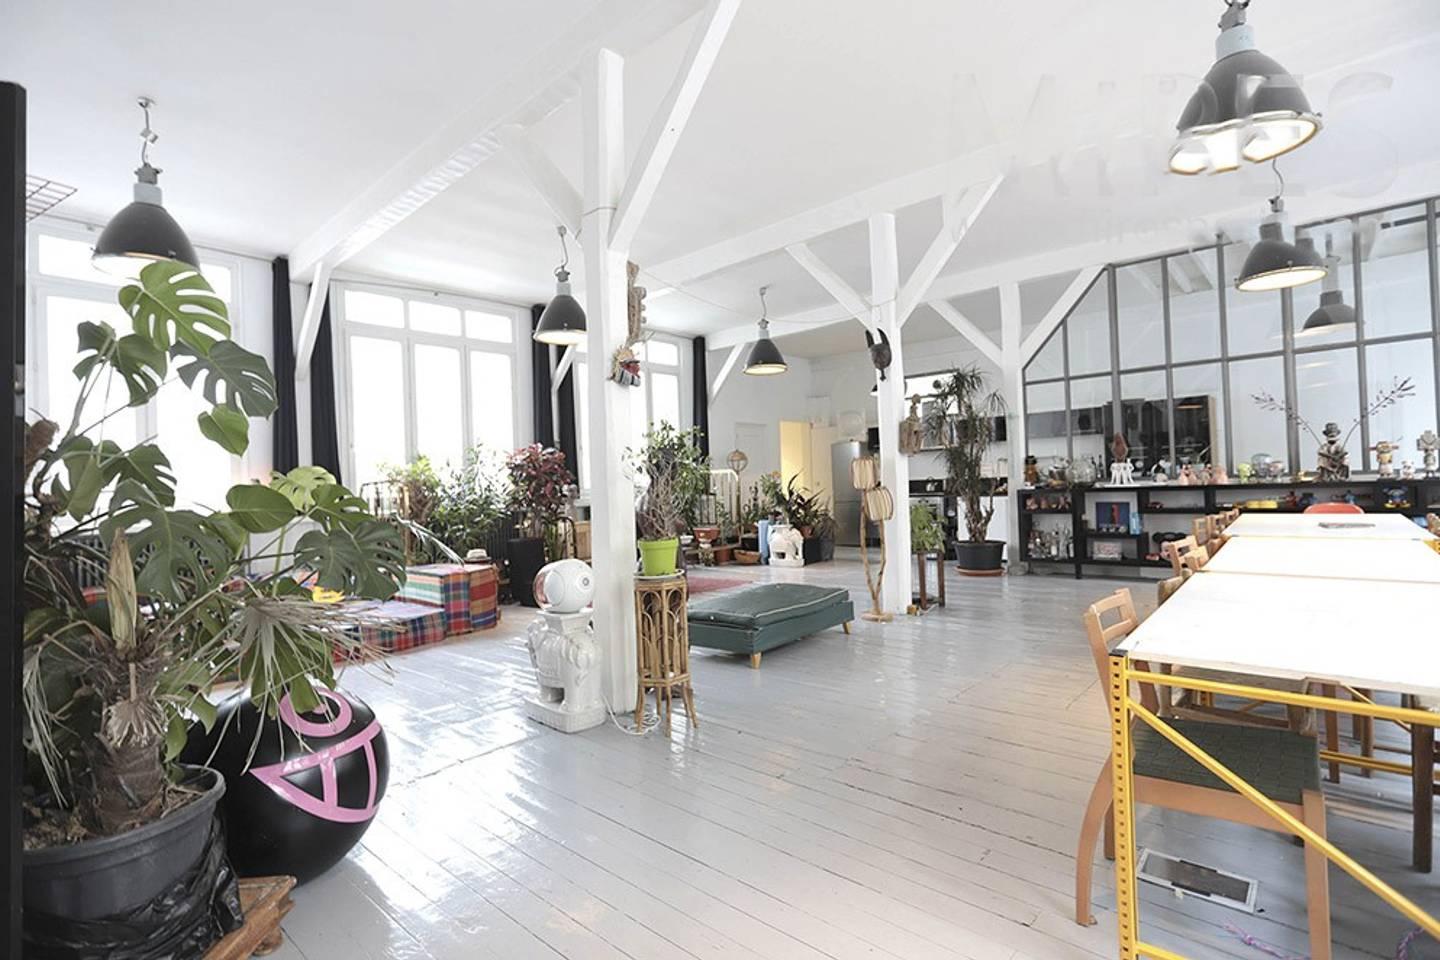 amazing airbnb paris loft near museums